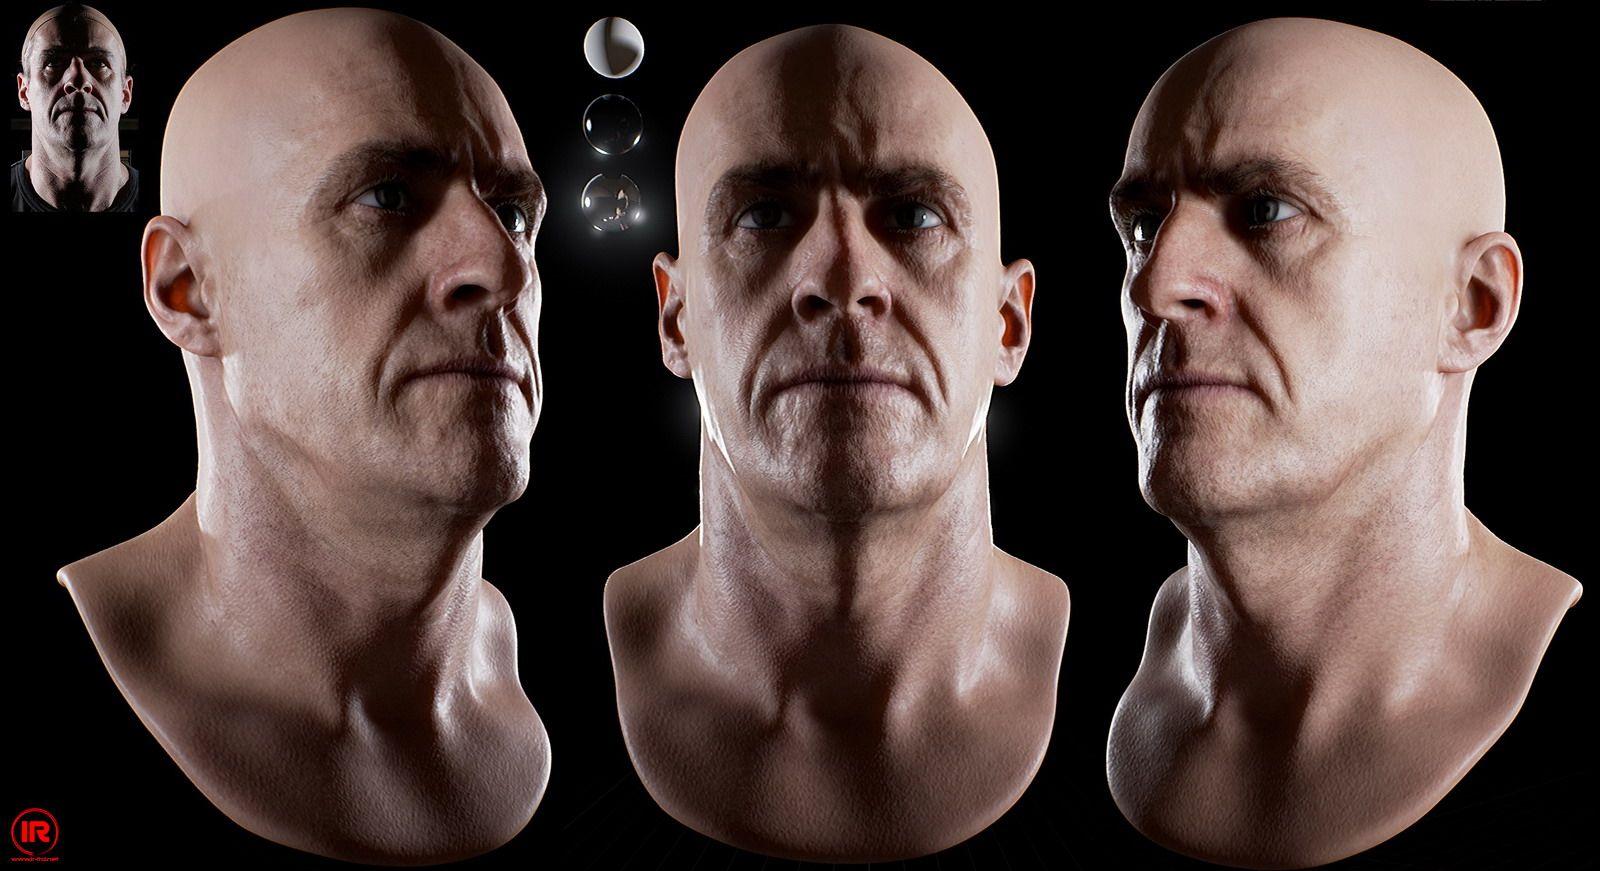 UE4 Skin Shader and Virtual Character Rendering | Infinite